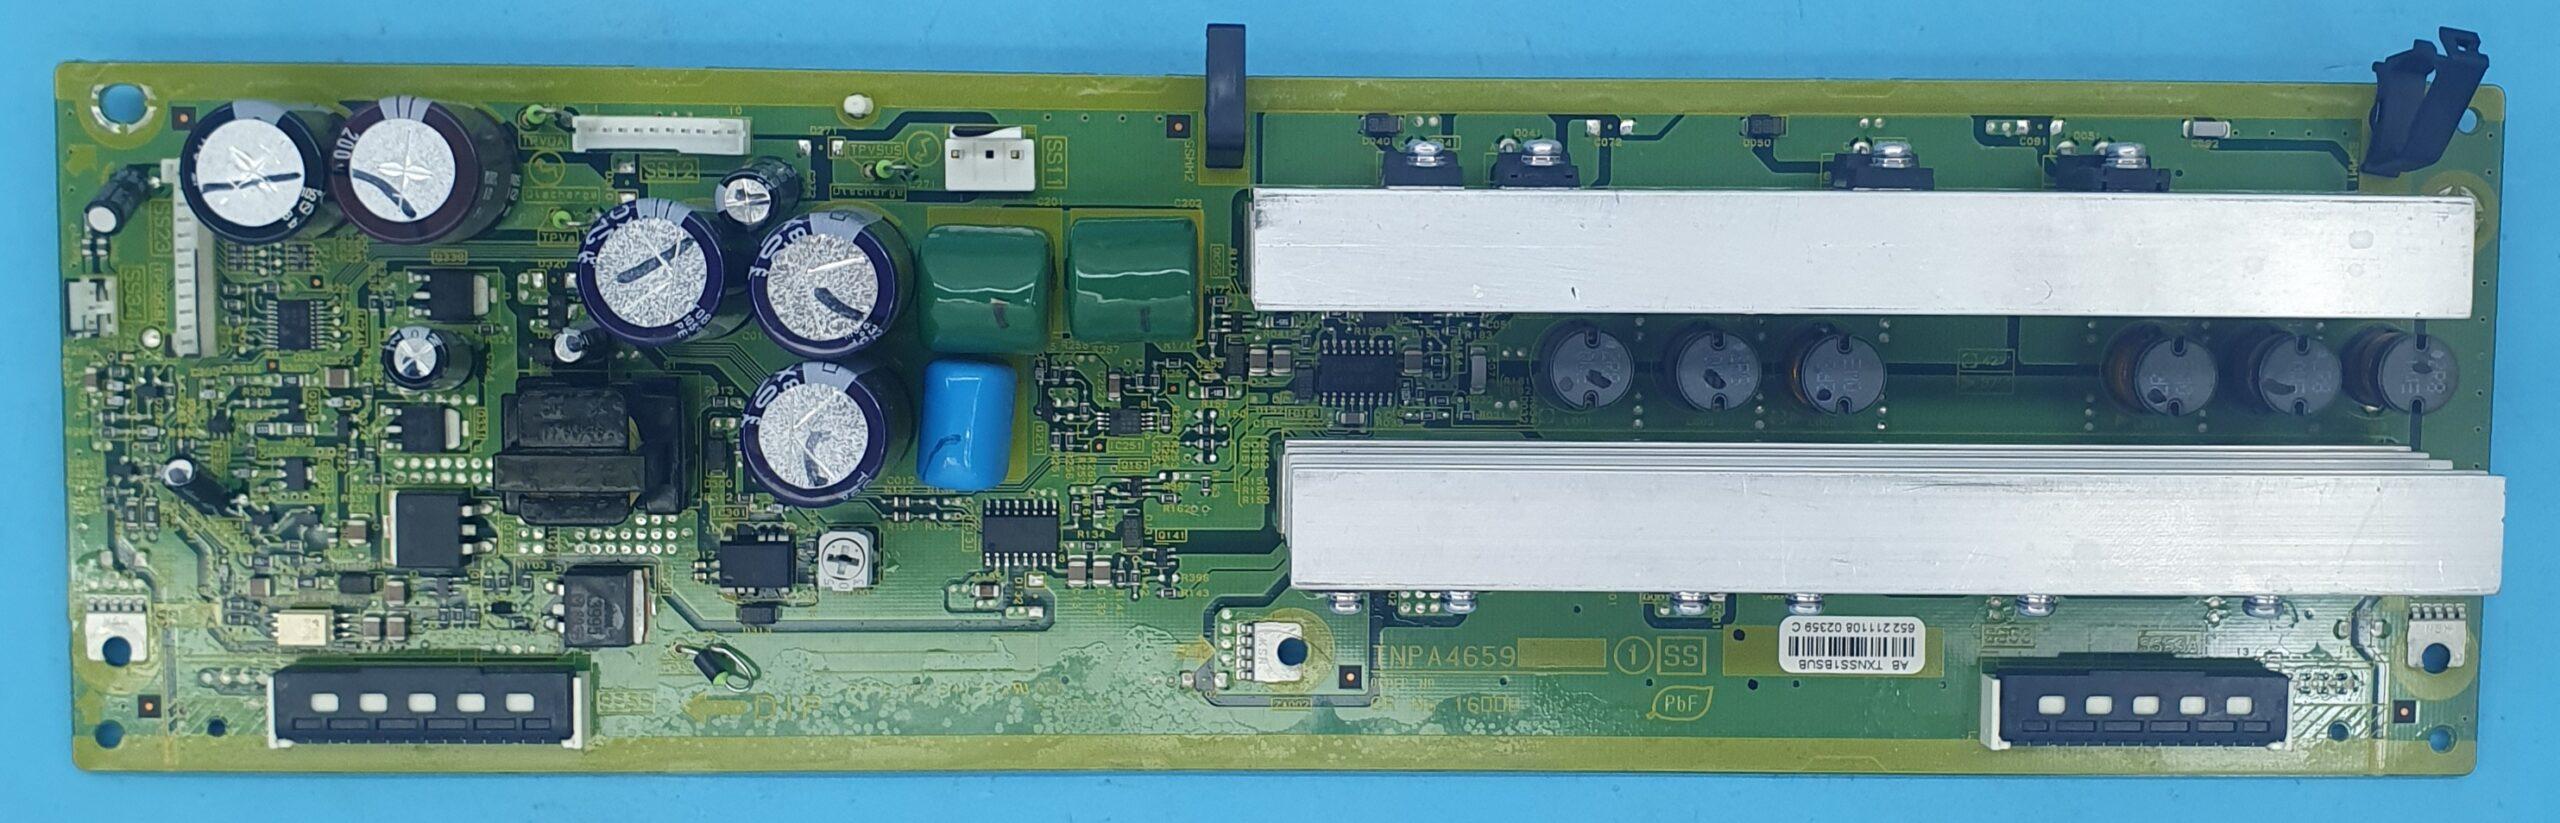 TNPA4659 Panasonic Z-SUS (KDV DAHİL = 150 TL)